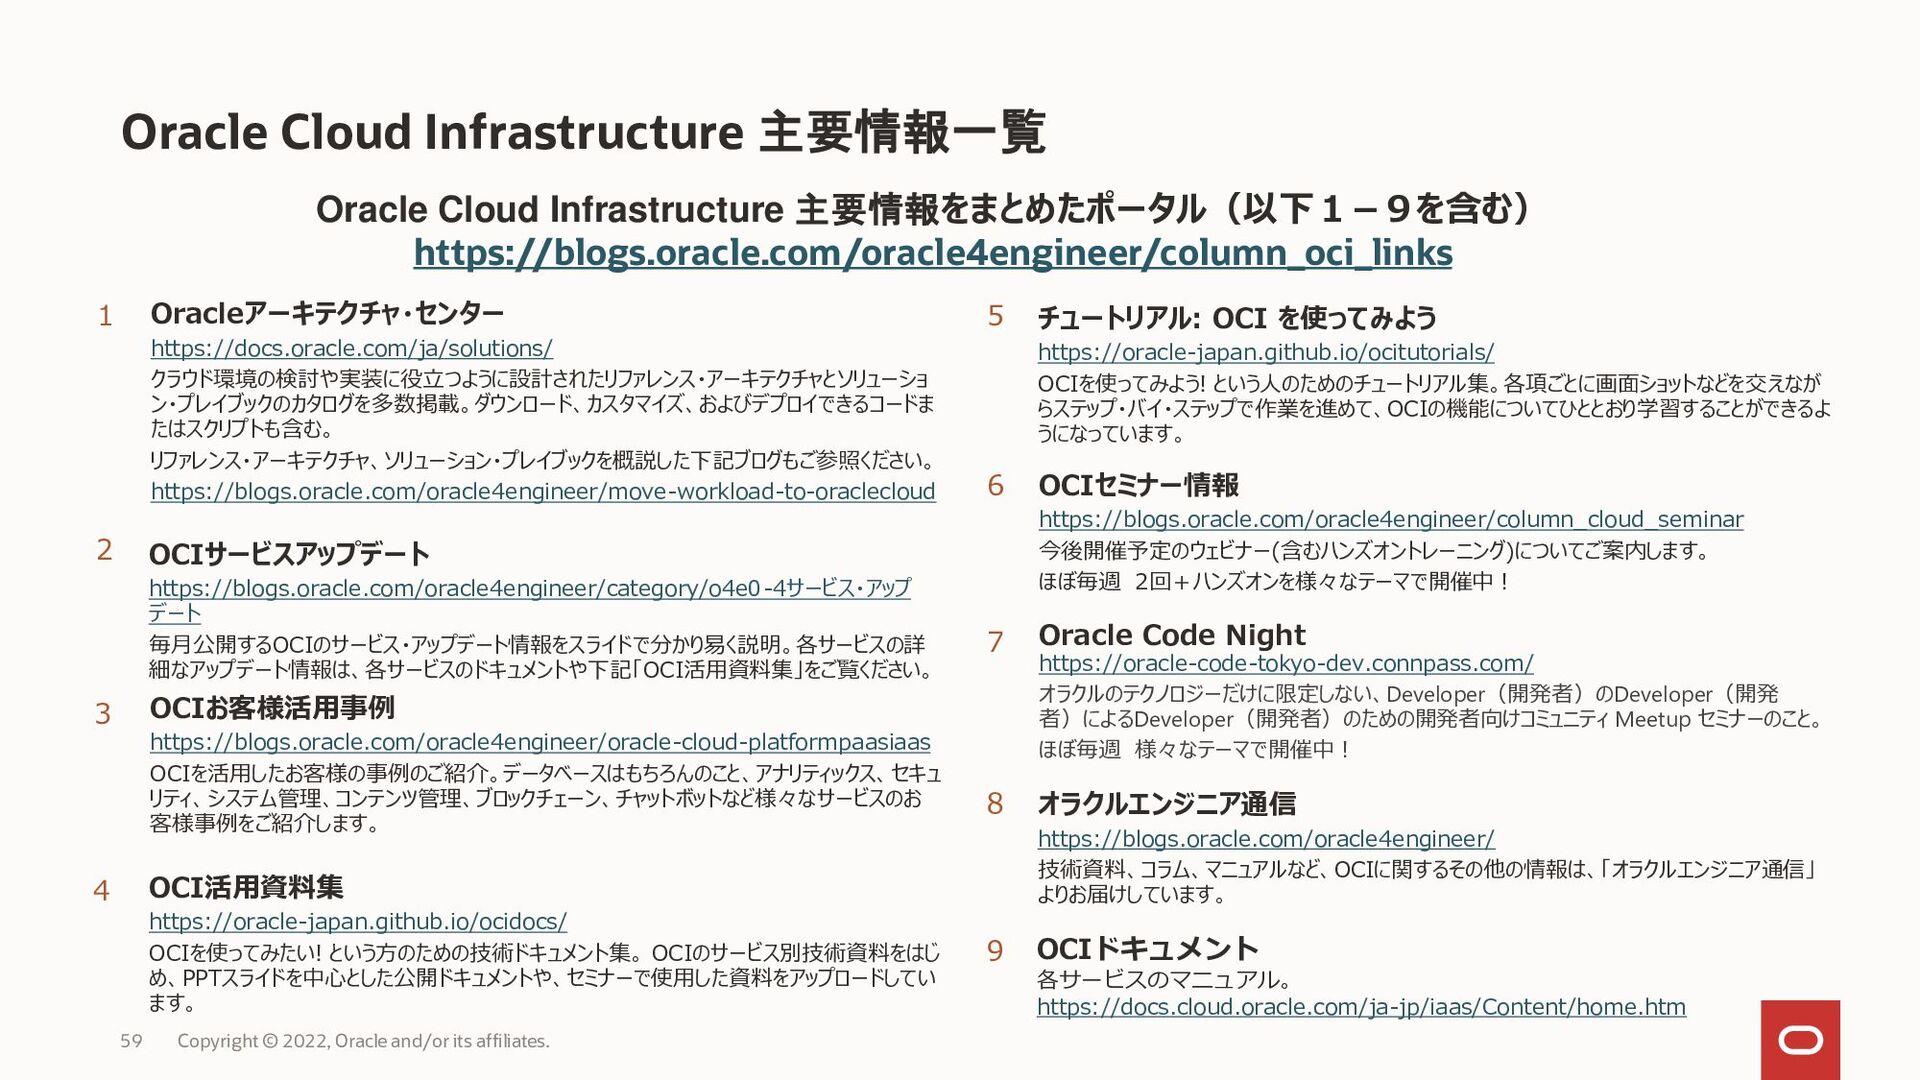 【MySQL お問い合わせ窓口】 0120-065556 【受付時間】 平日 9:00-12:...